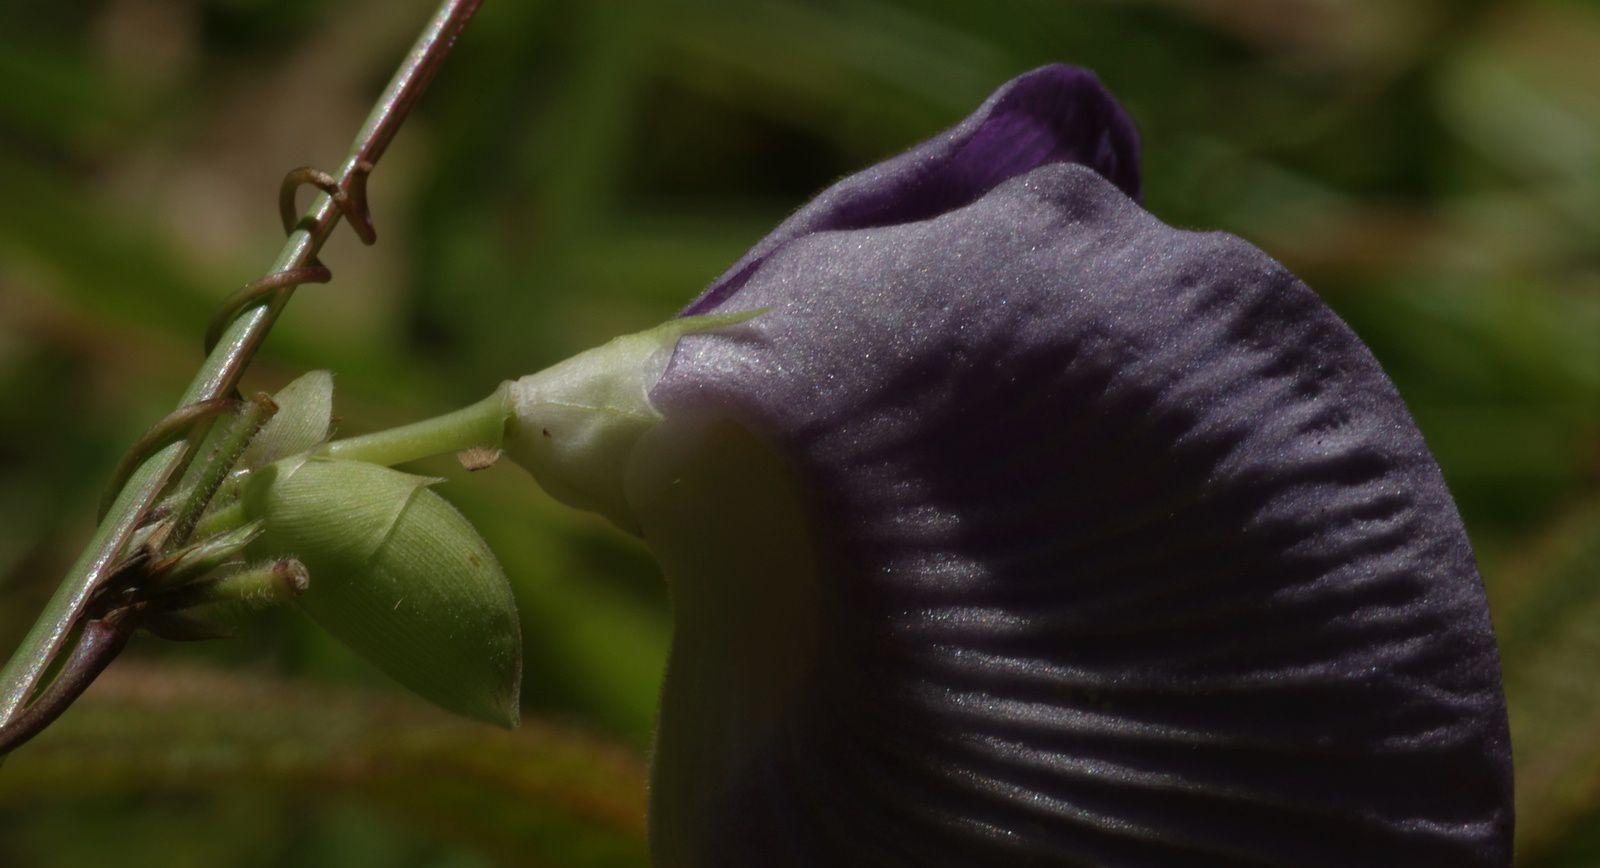 Centrosema brasilianum (foufoune)